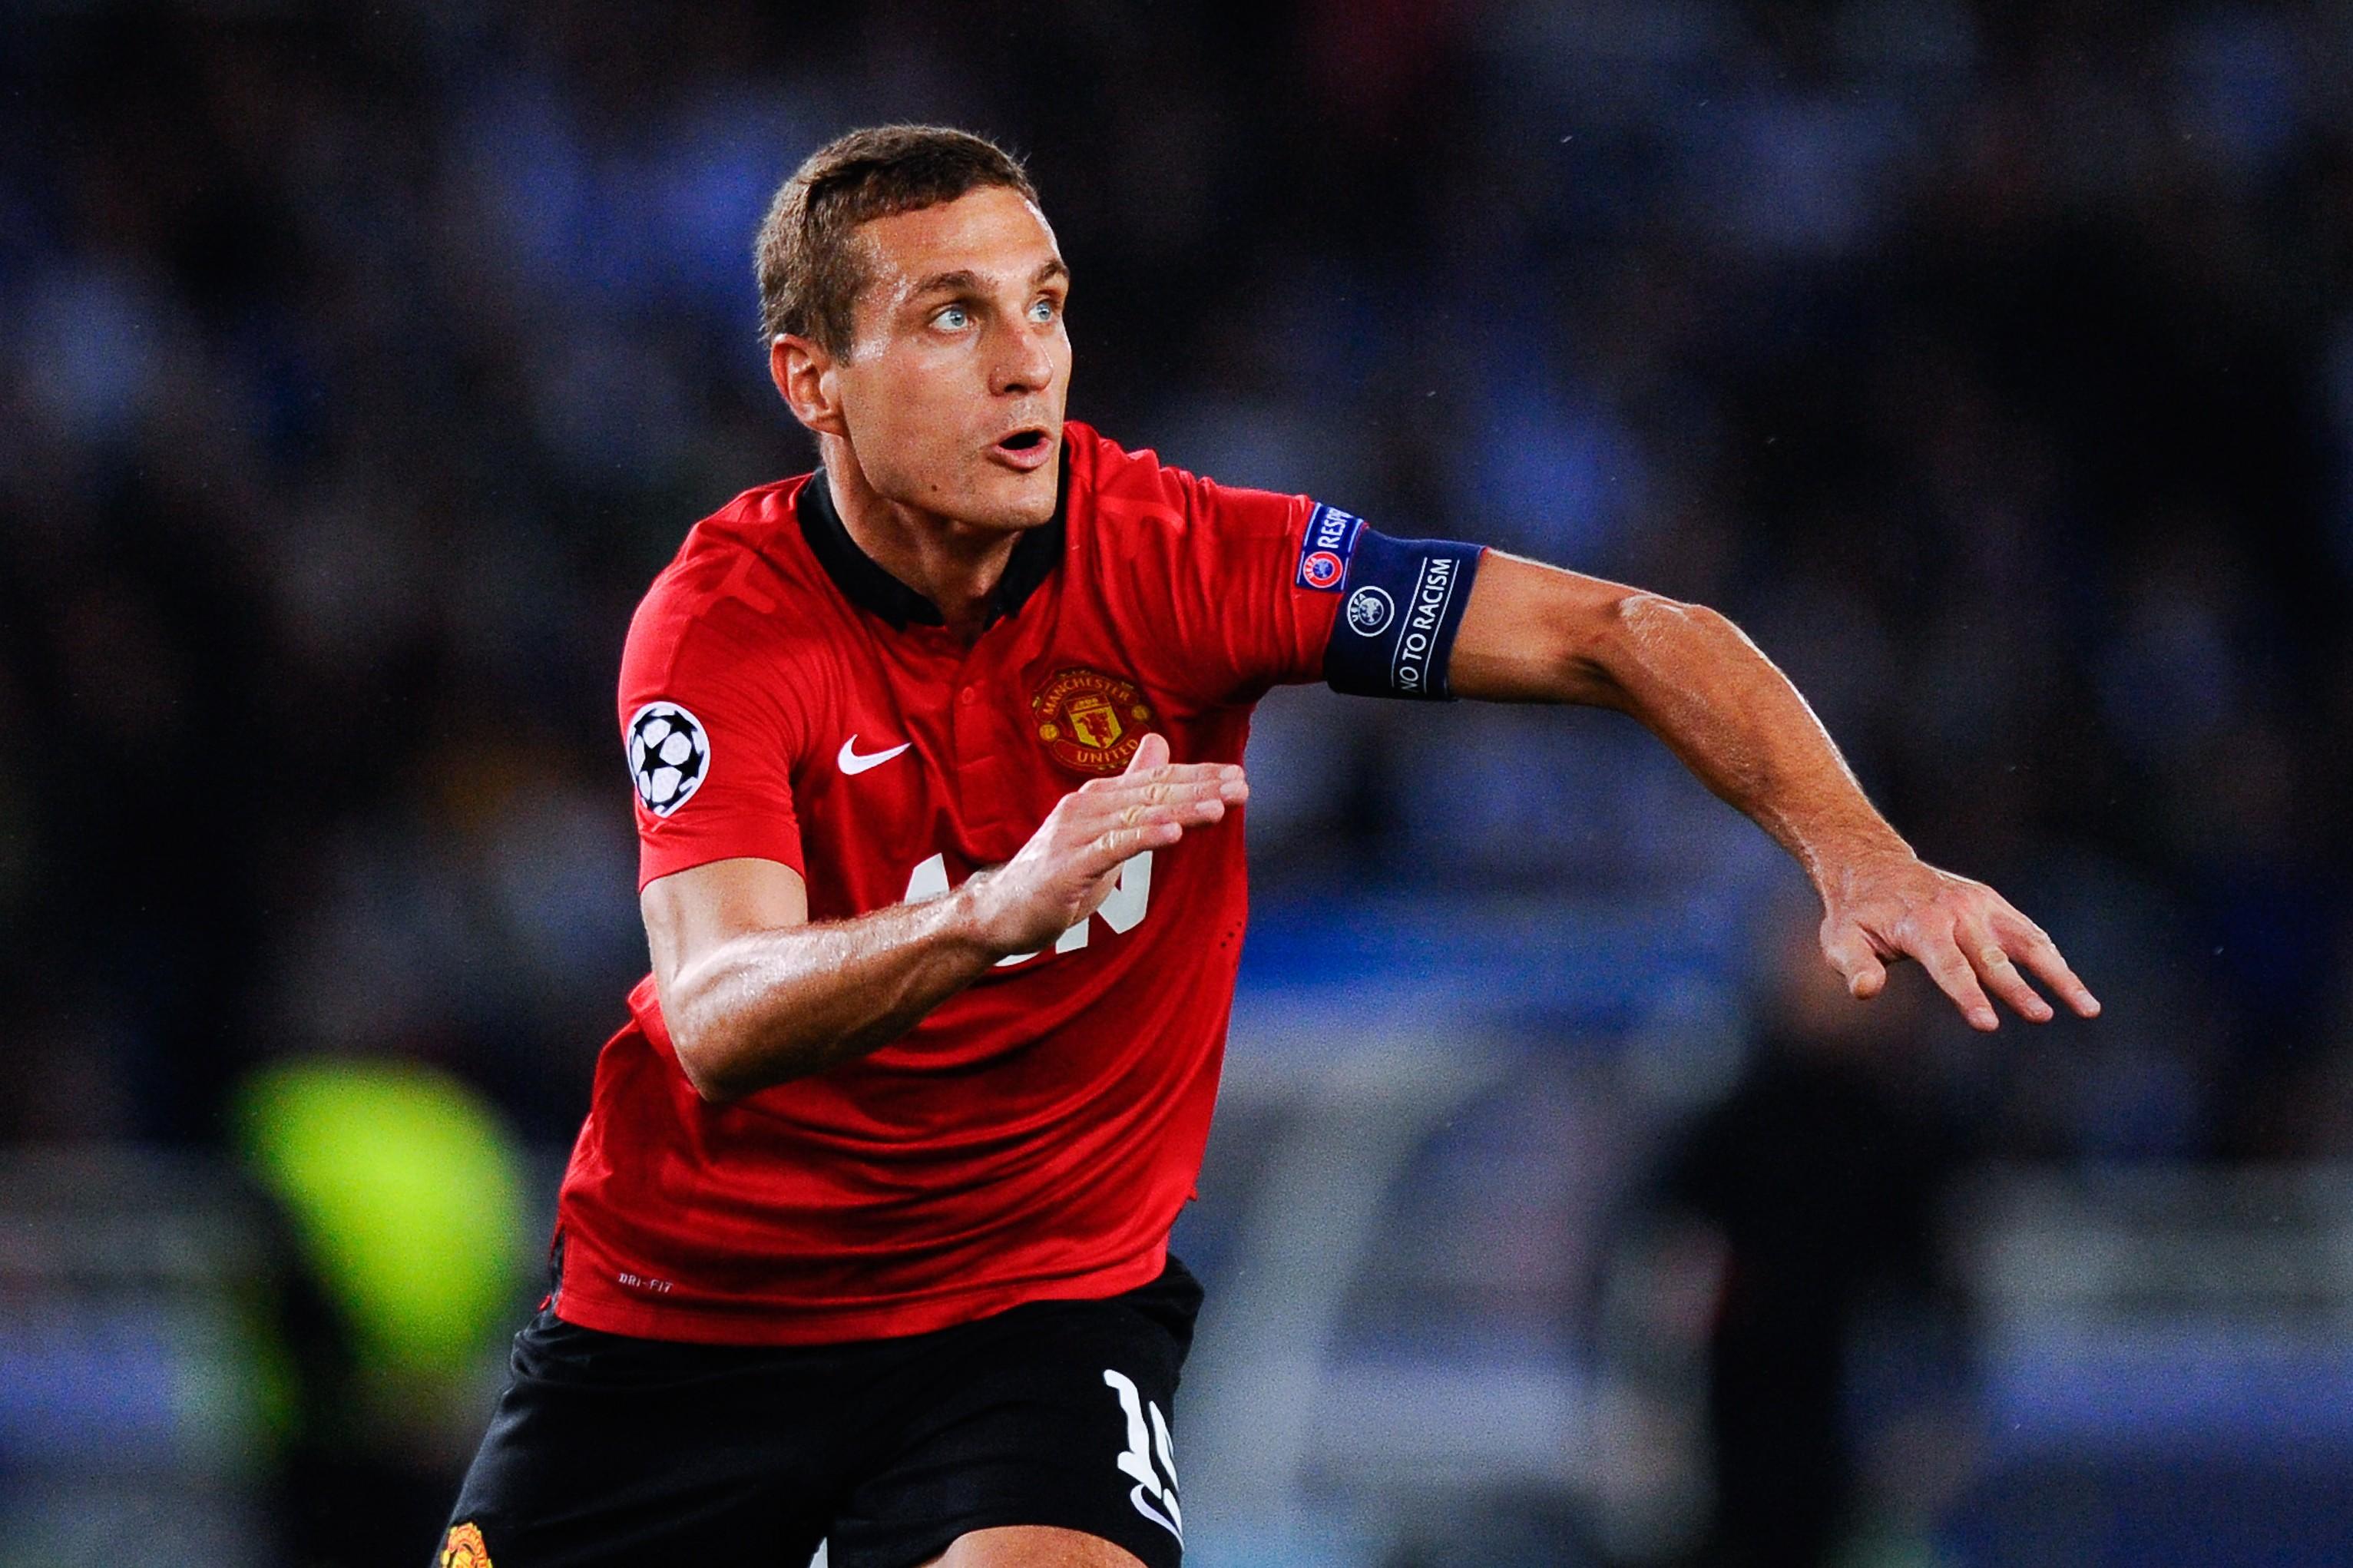 Nemanja Vidic set to snub Juventus to sign new Manchester United contract